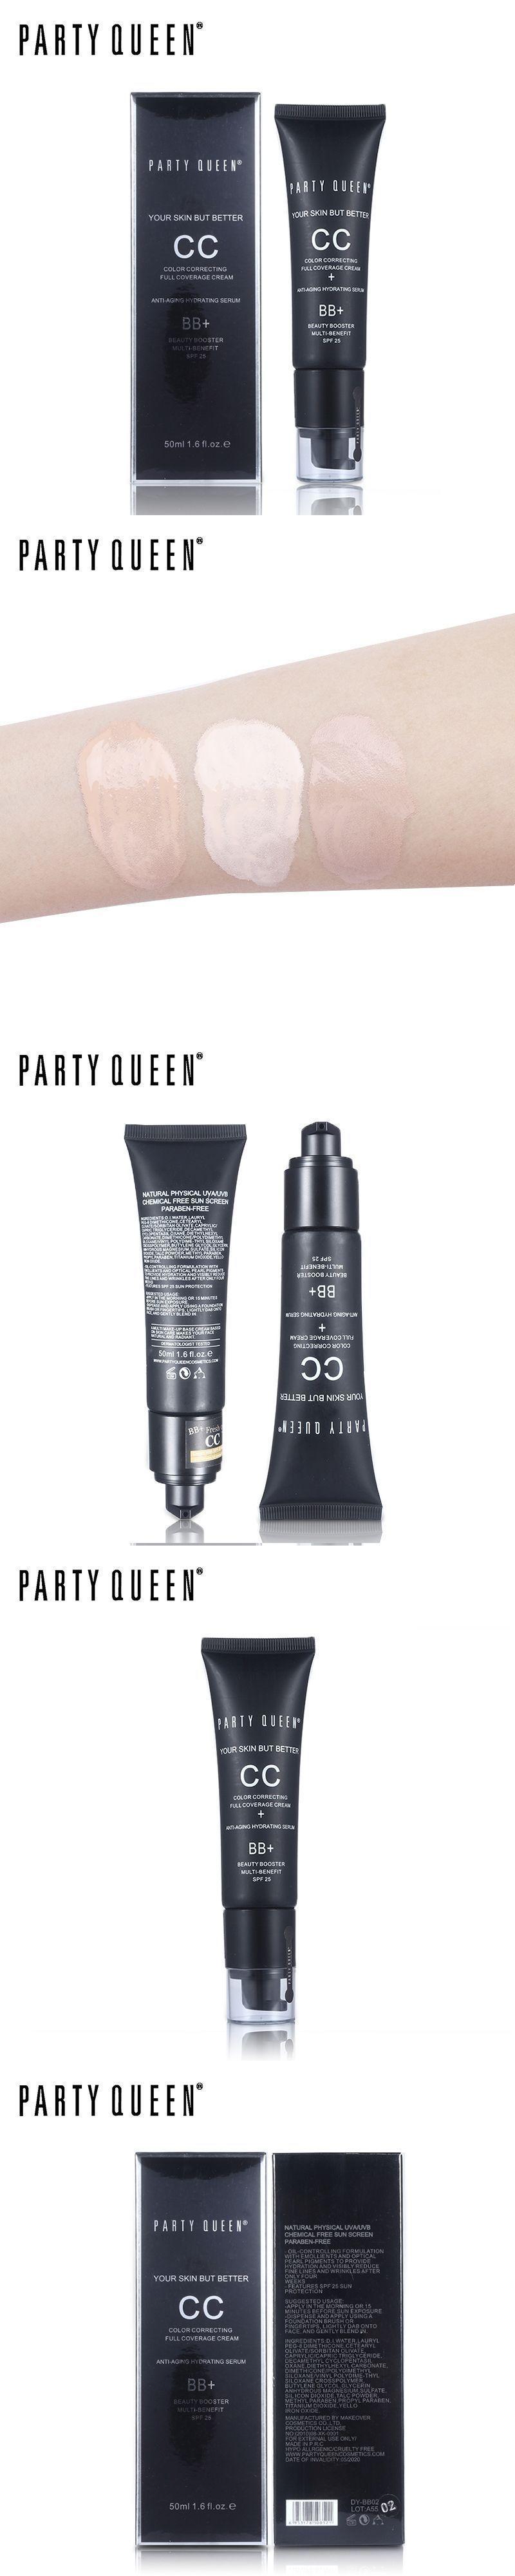 Party Queen Concealer Contouring Makeup Face Foundation CC Cream